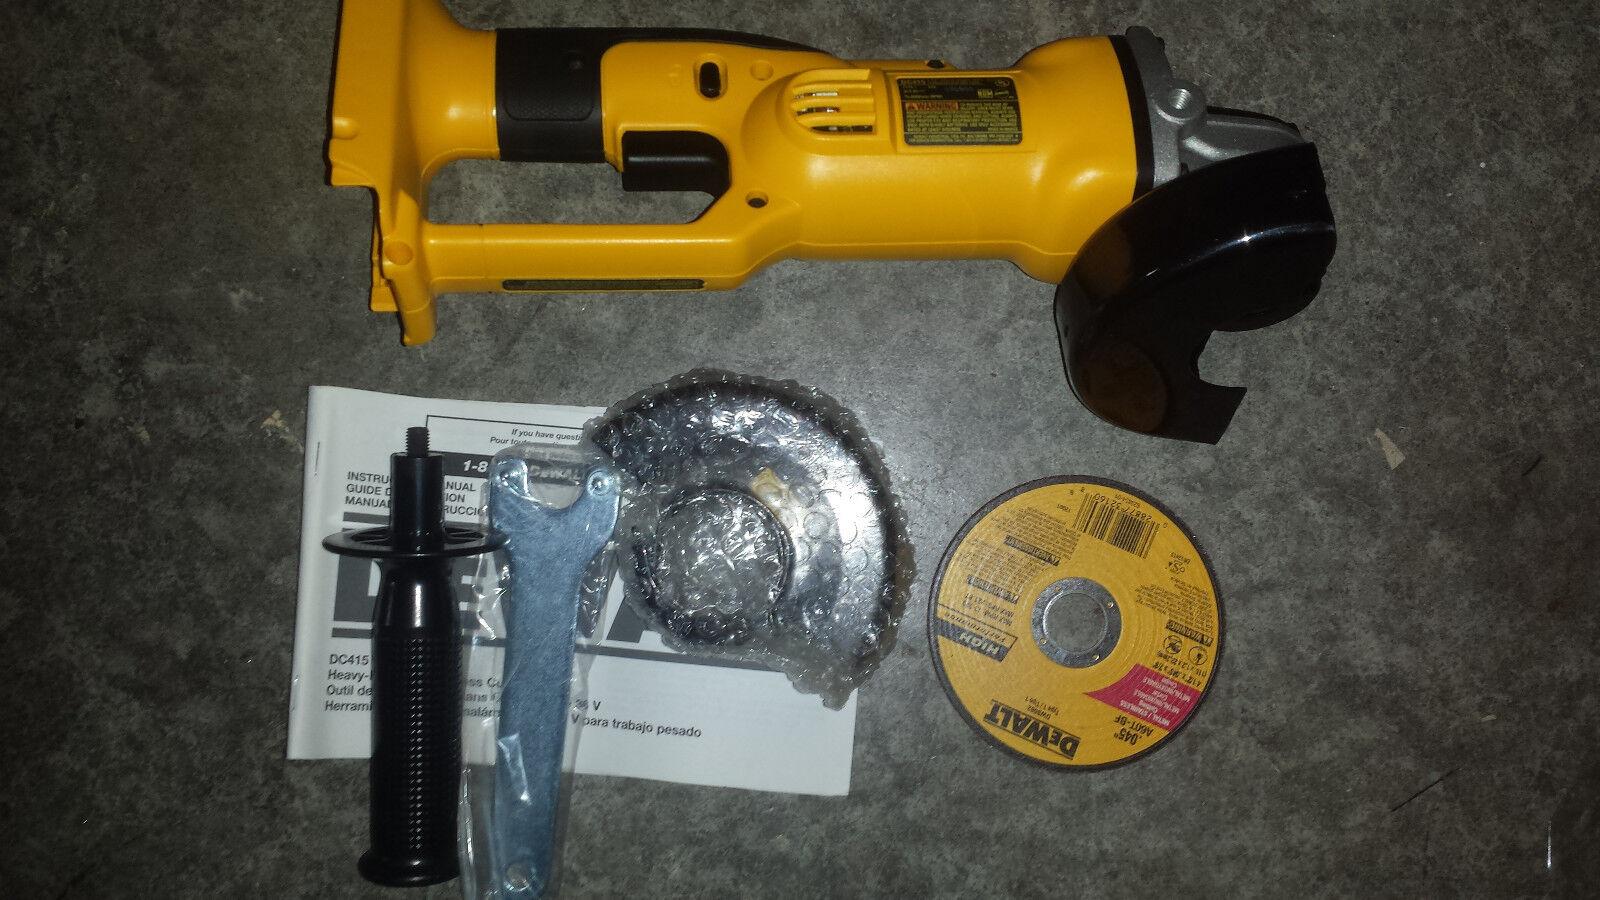 dewalt cut off tool. picture 1 of 4 dewalt cut off tool